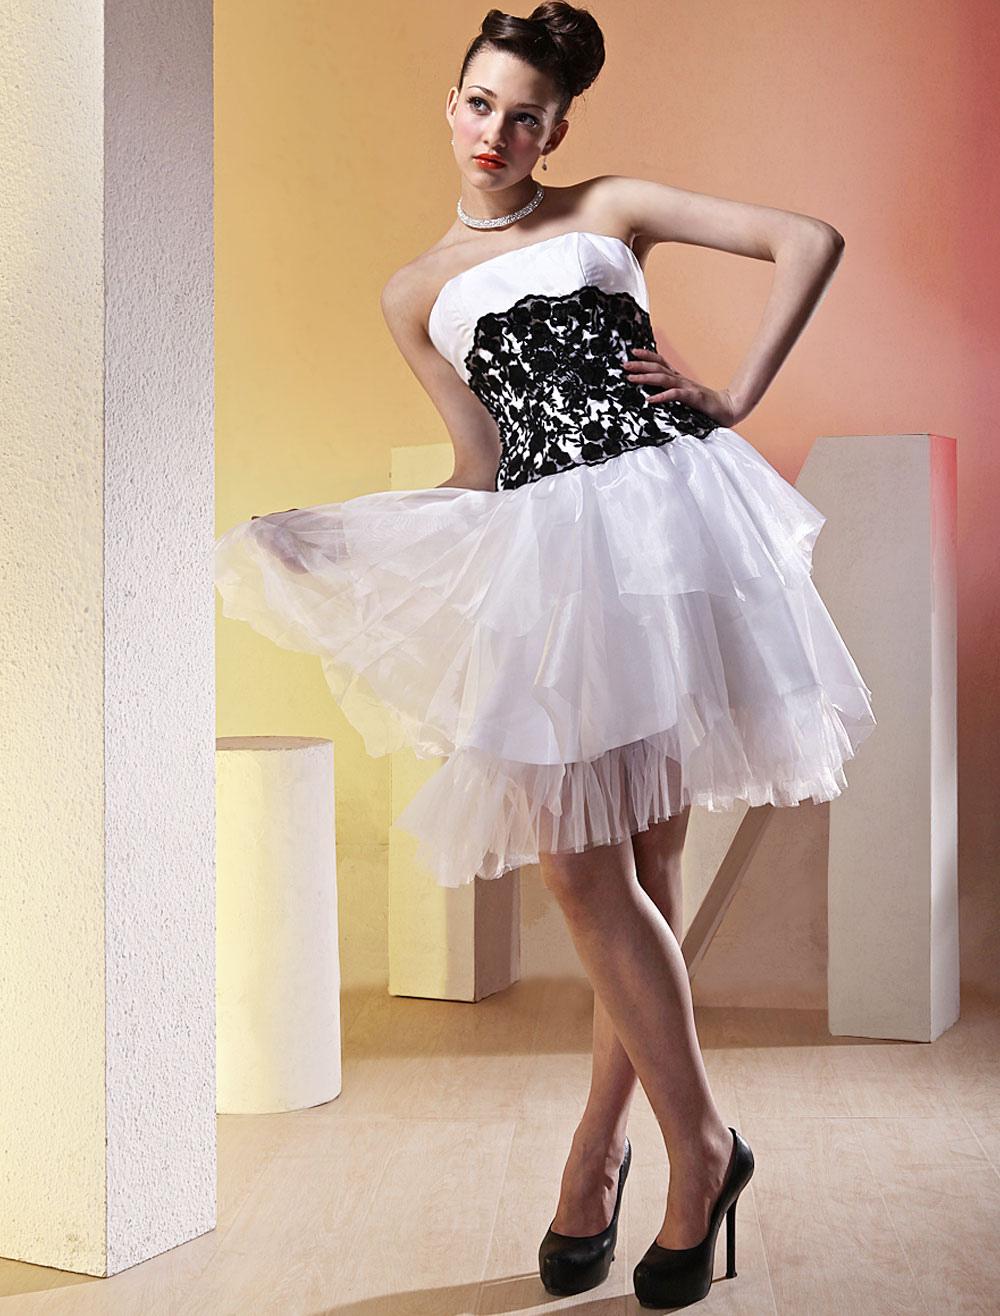 White Black Strapless Multi-Layer Skirt Tulle Cocktail Dress (Wedding Cheap Party Dress) photo